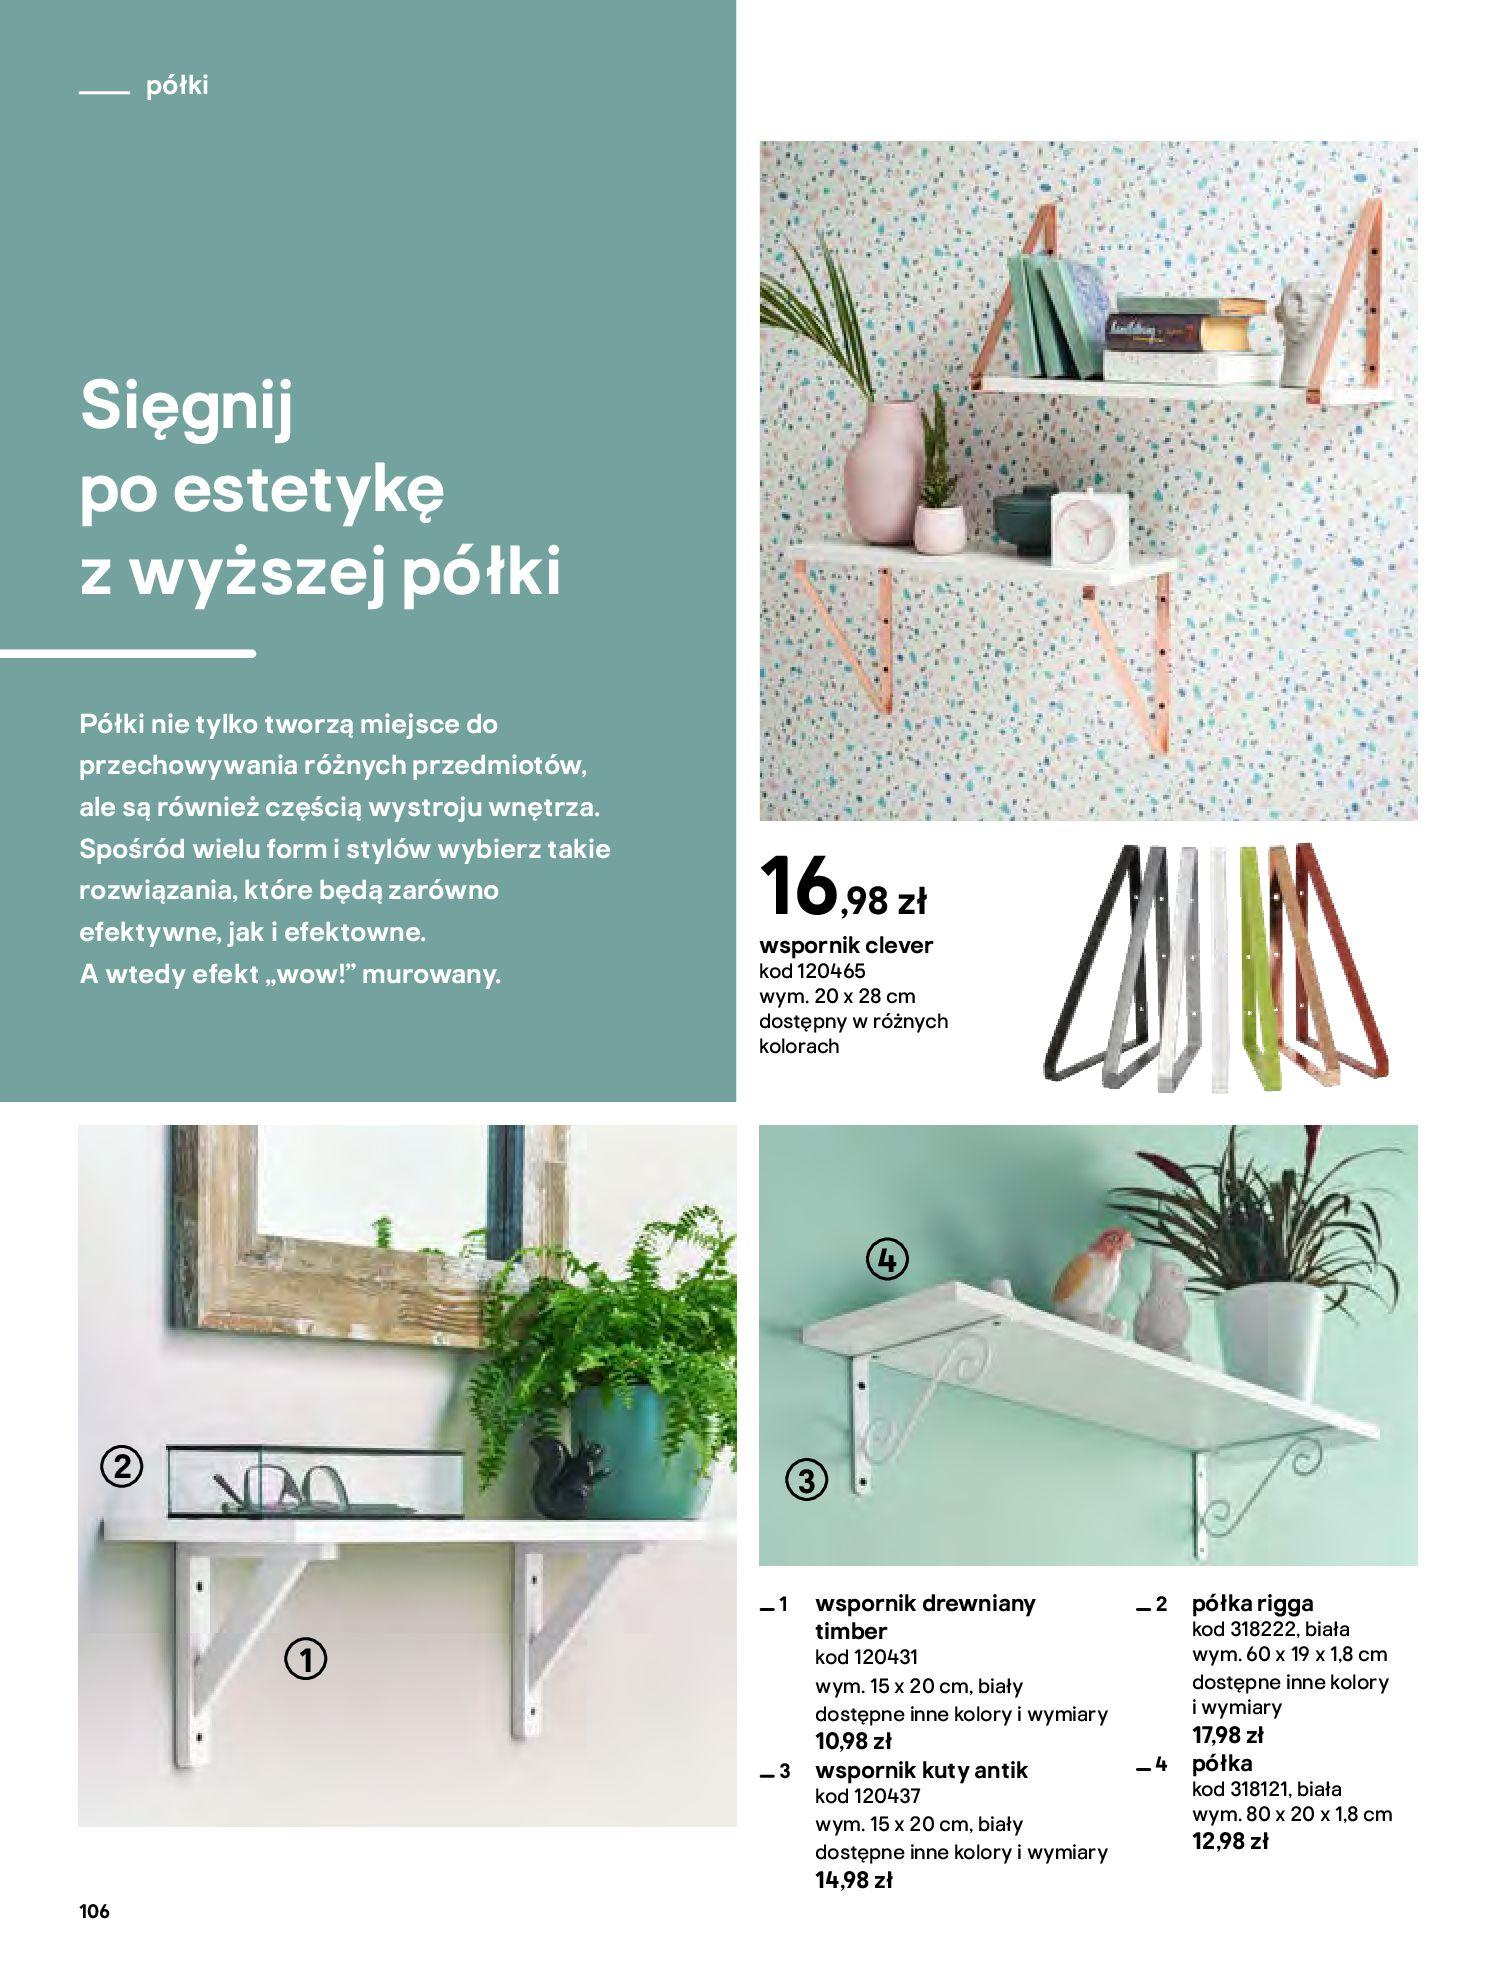 Gazetka Castorama - Katalog Dekoracje-22.10.2020-31.12.2020-page-106